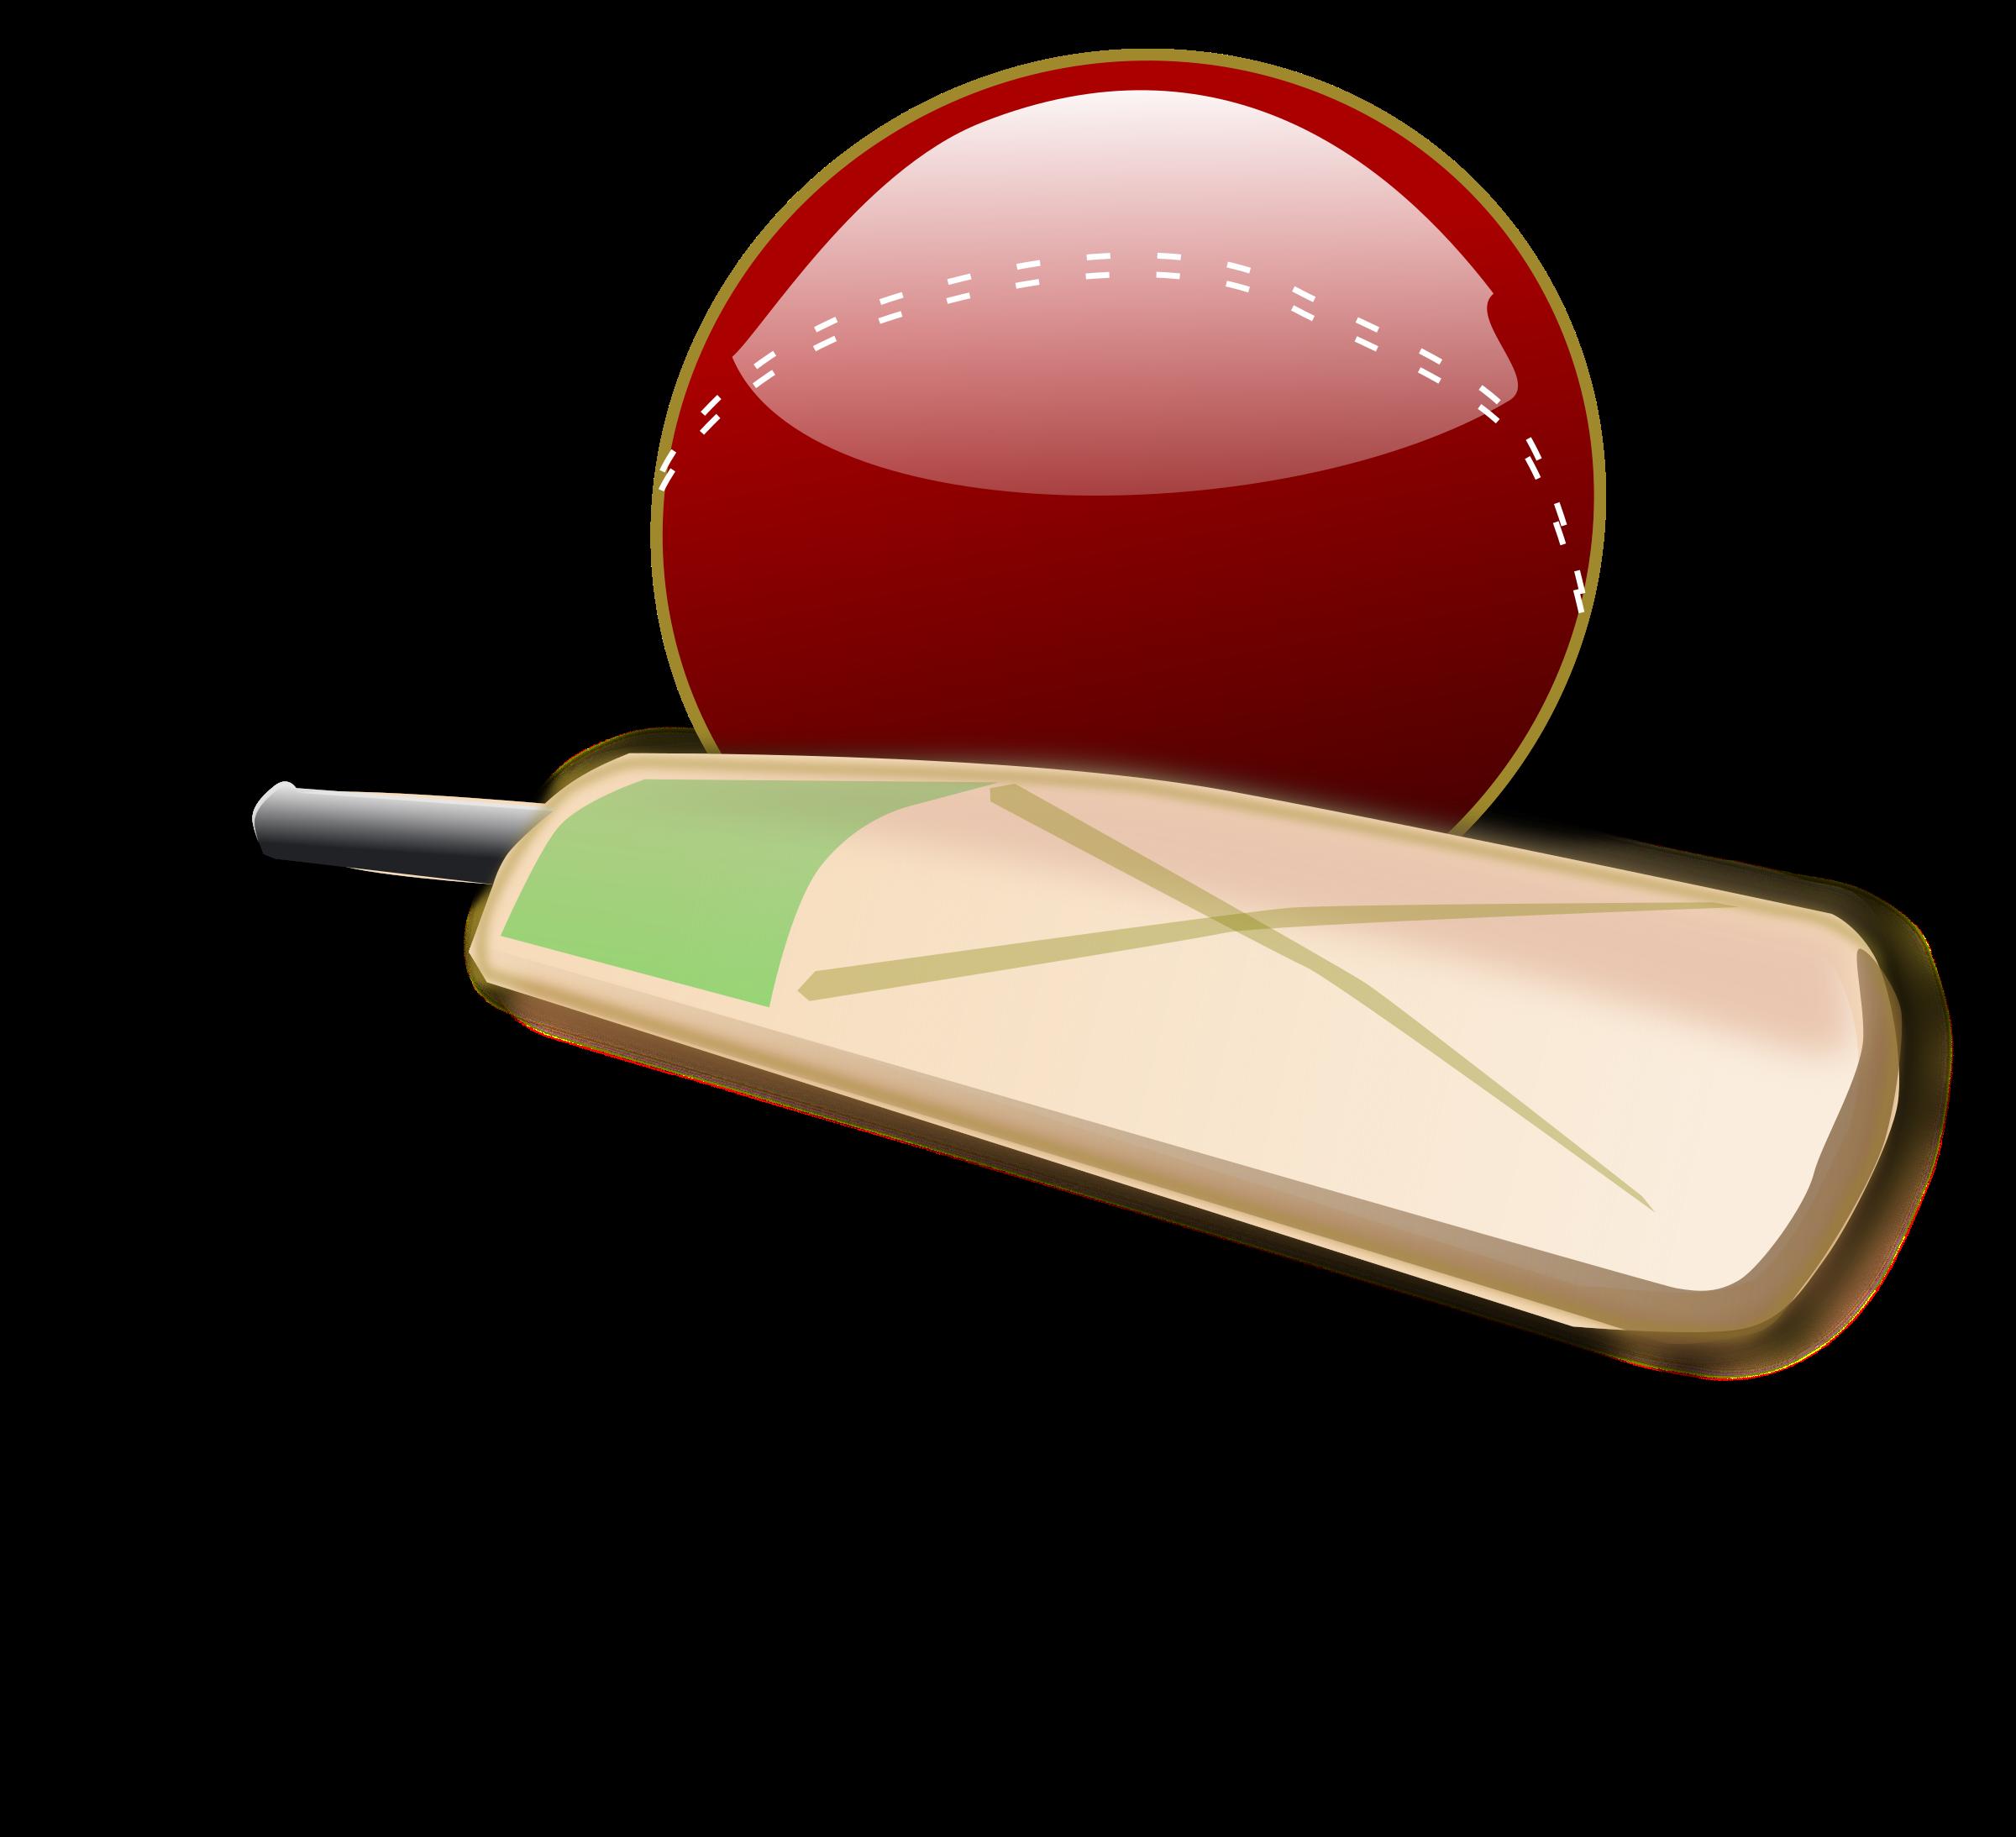 Girls clipart cricket. Big image png